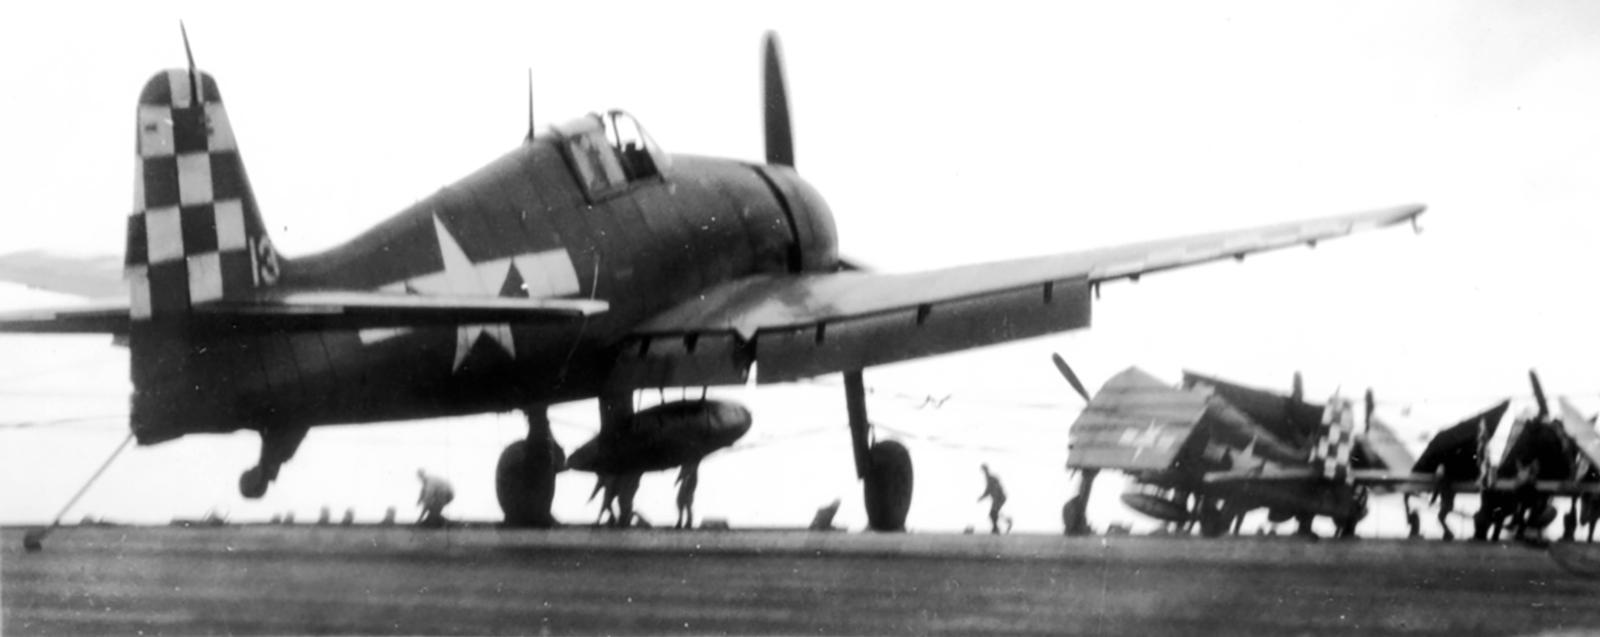 Grumman F6F 5 Hellcat VF 46 White 13 landing mishap CVL 22 USS Independence 02